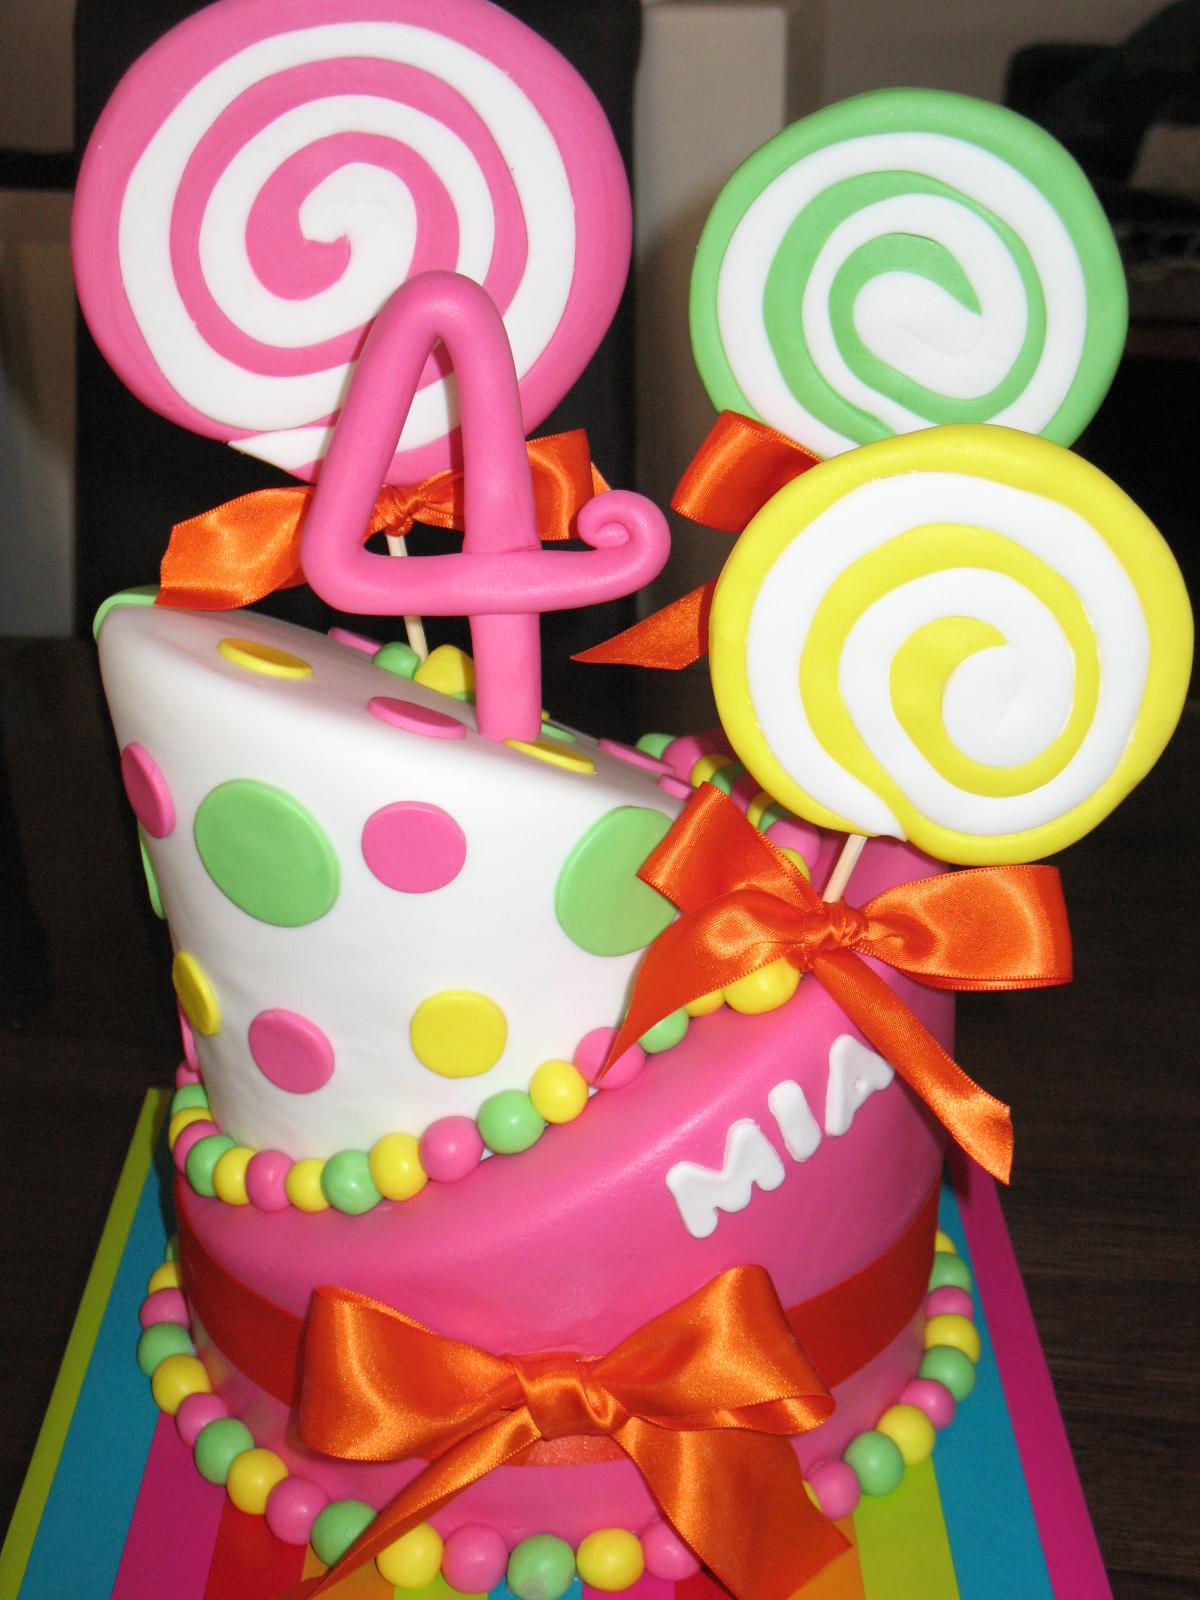 Sandy's Cakes: Mia's Lollipop Cake